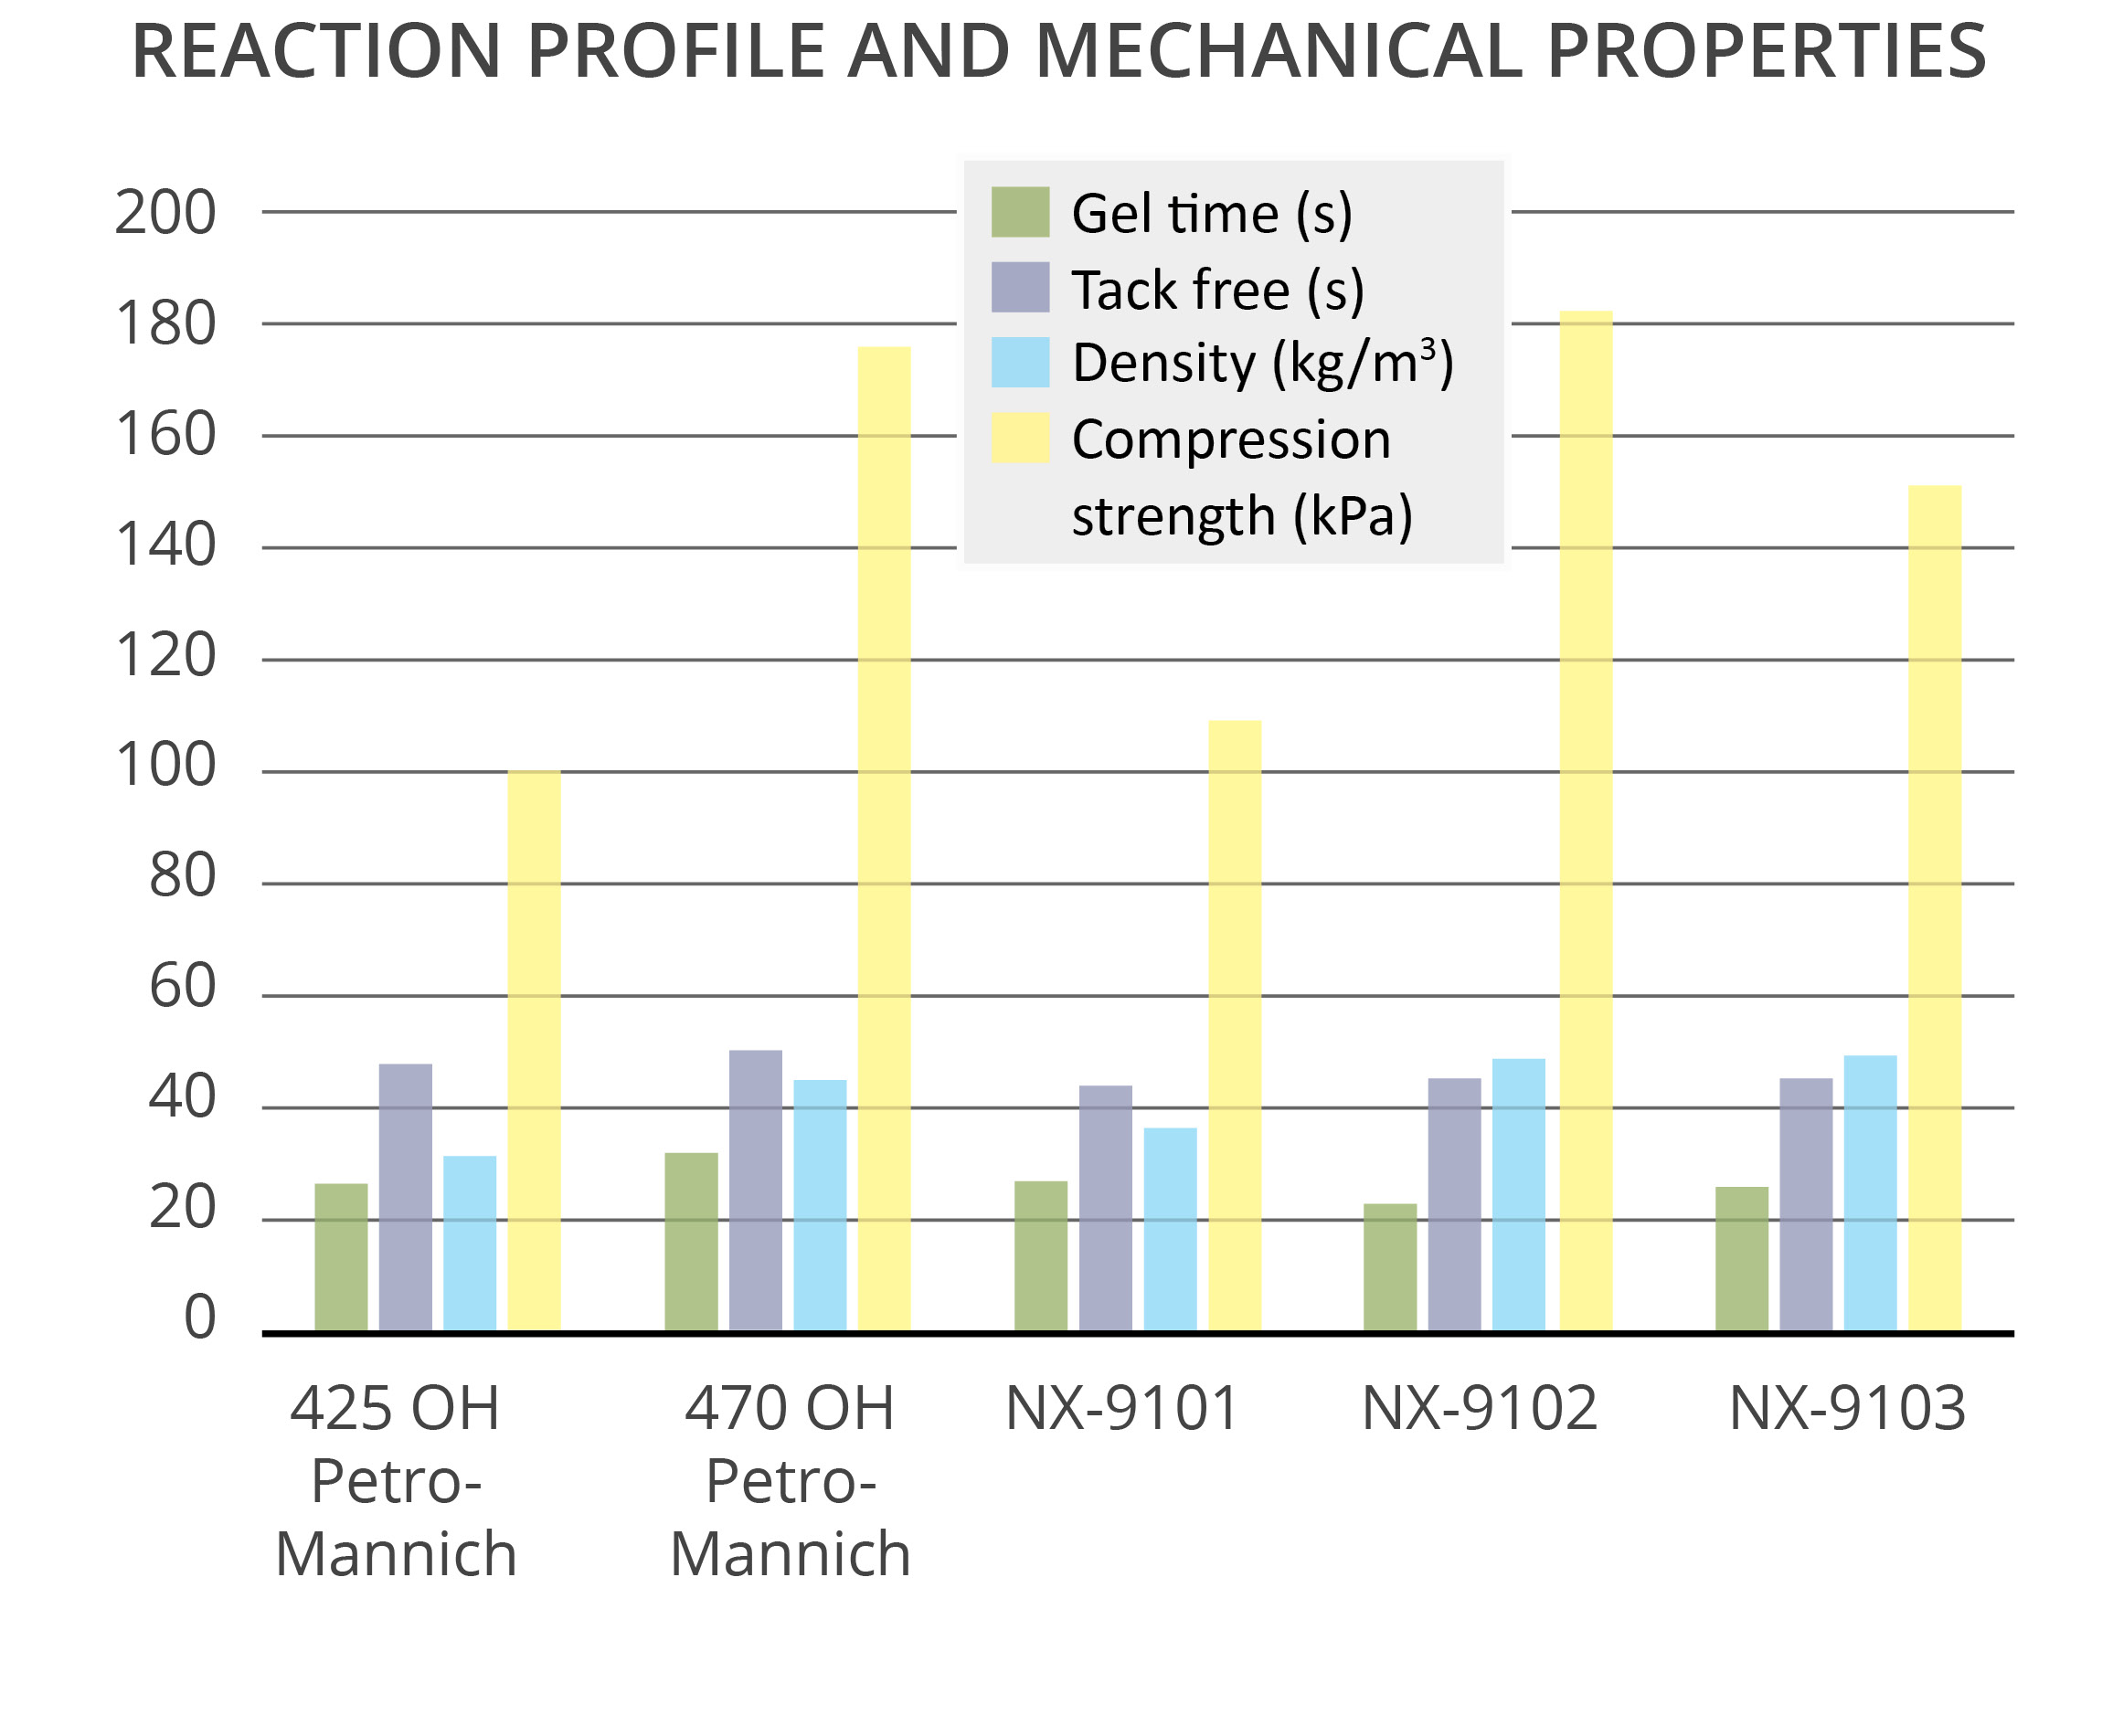 CNSL Mannich polyols show very good reactivity in polyurethane foams